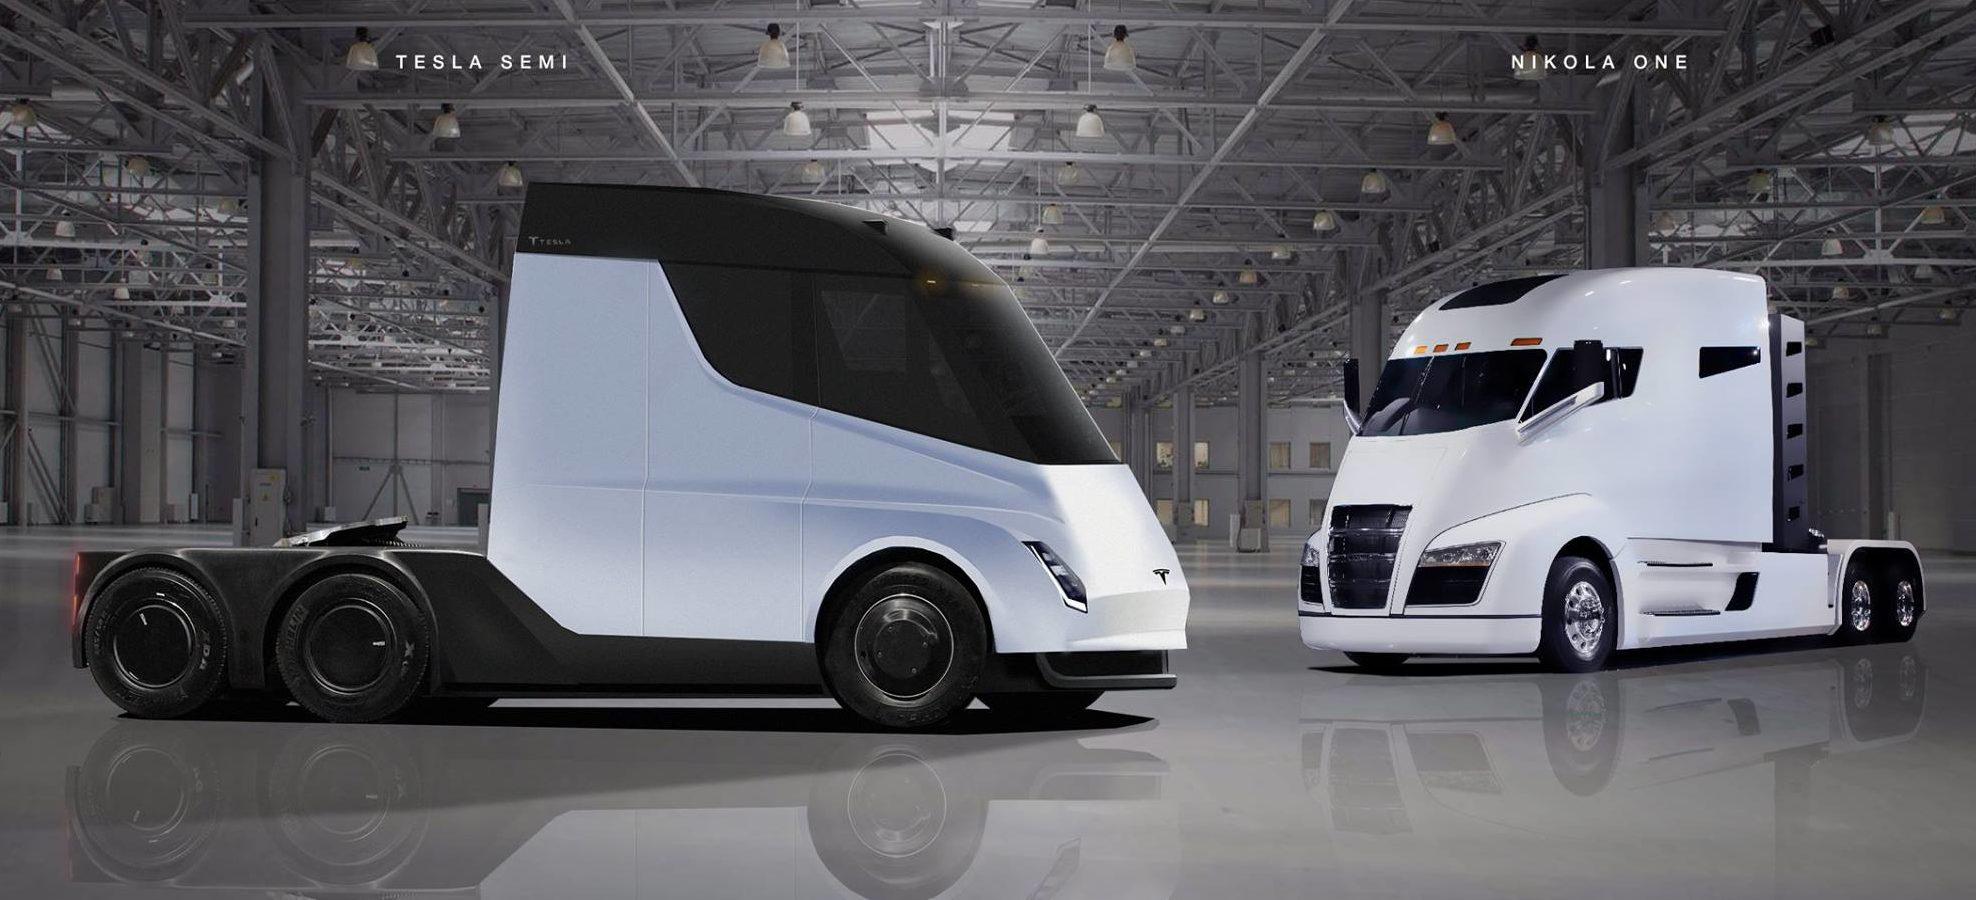 Tesla Semi Truck Interior